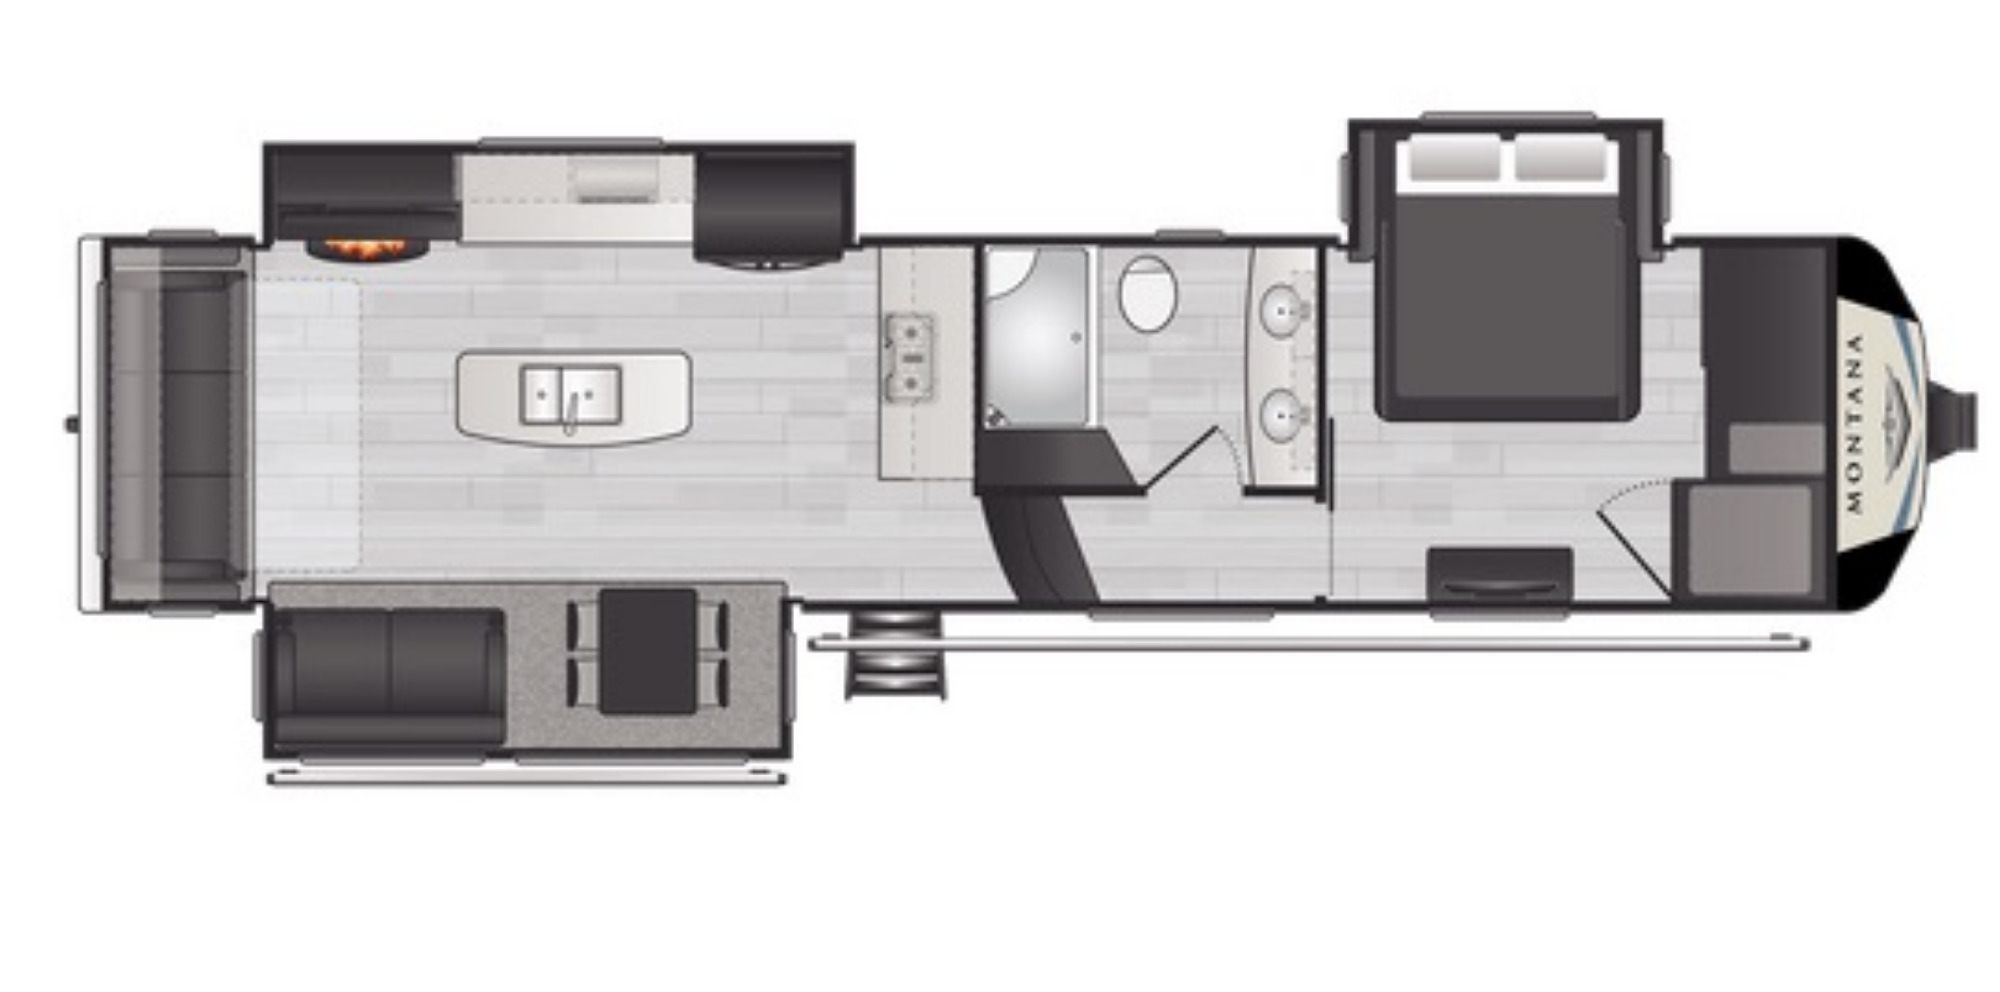 View Floor Plan for 2021 KEYSTONE MONTANA 3230CK